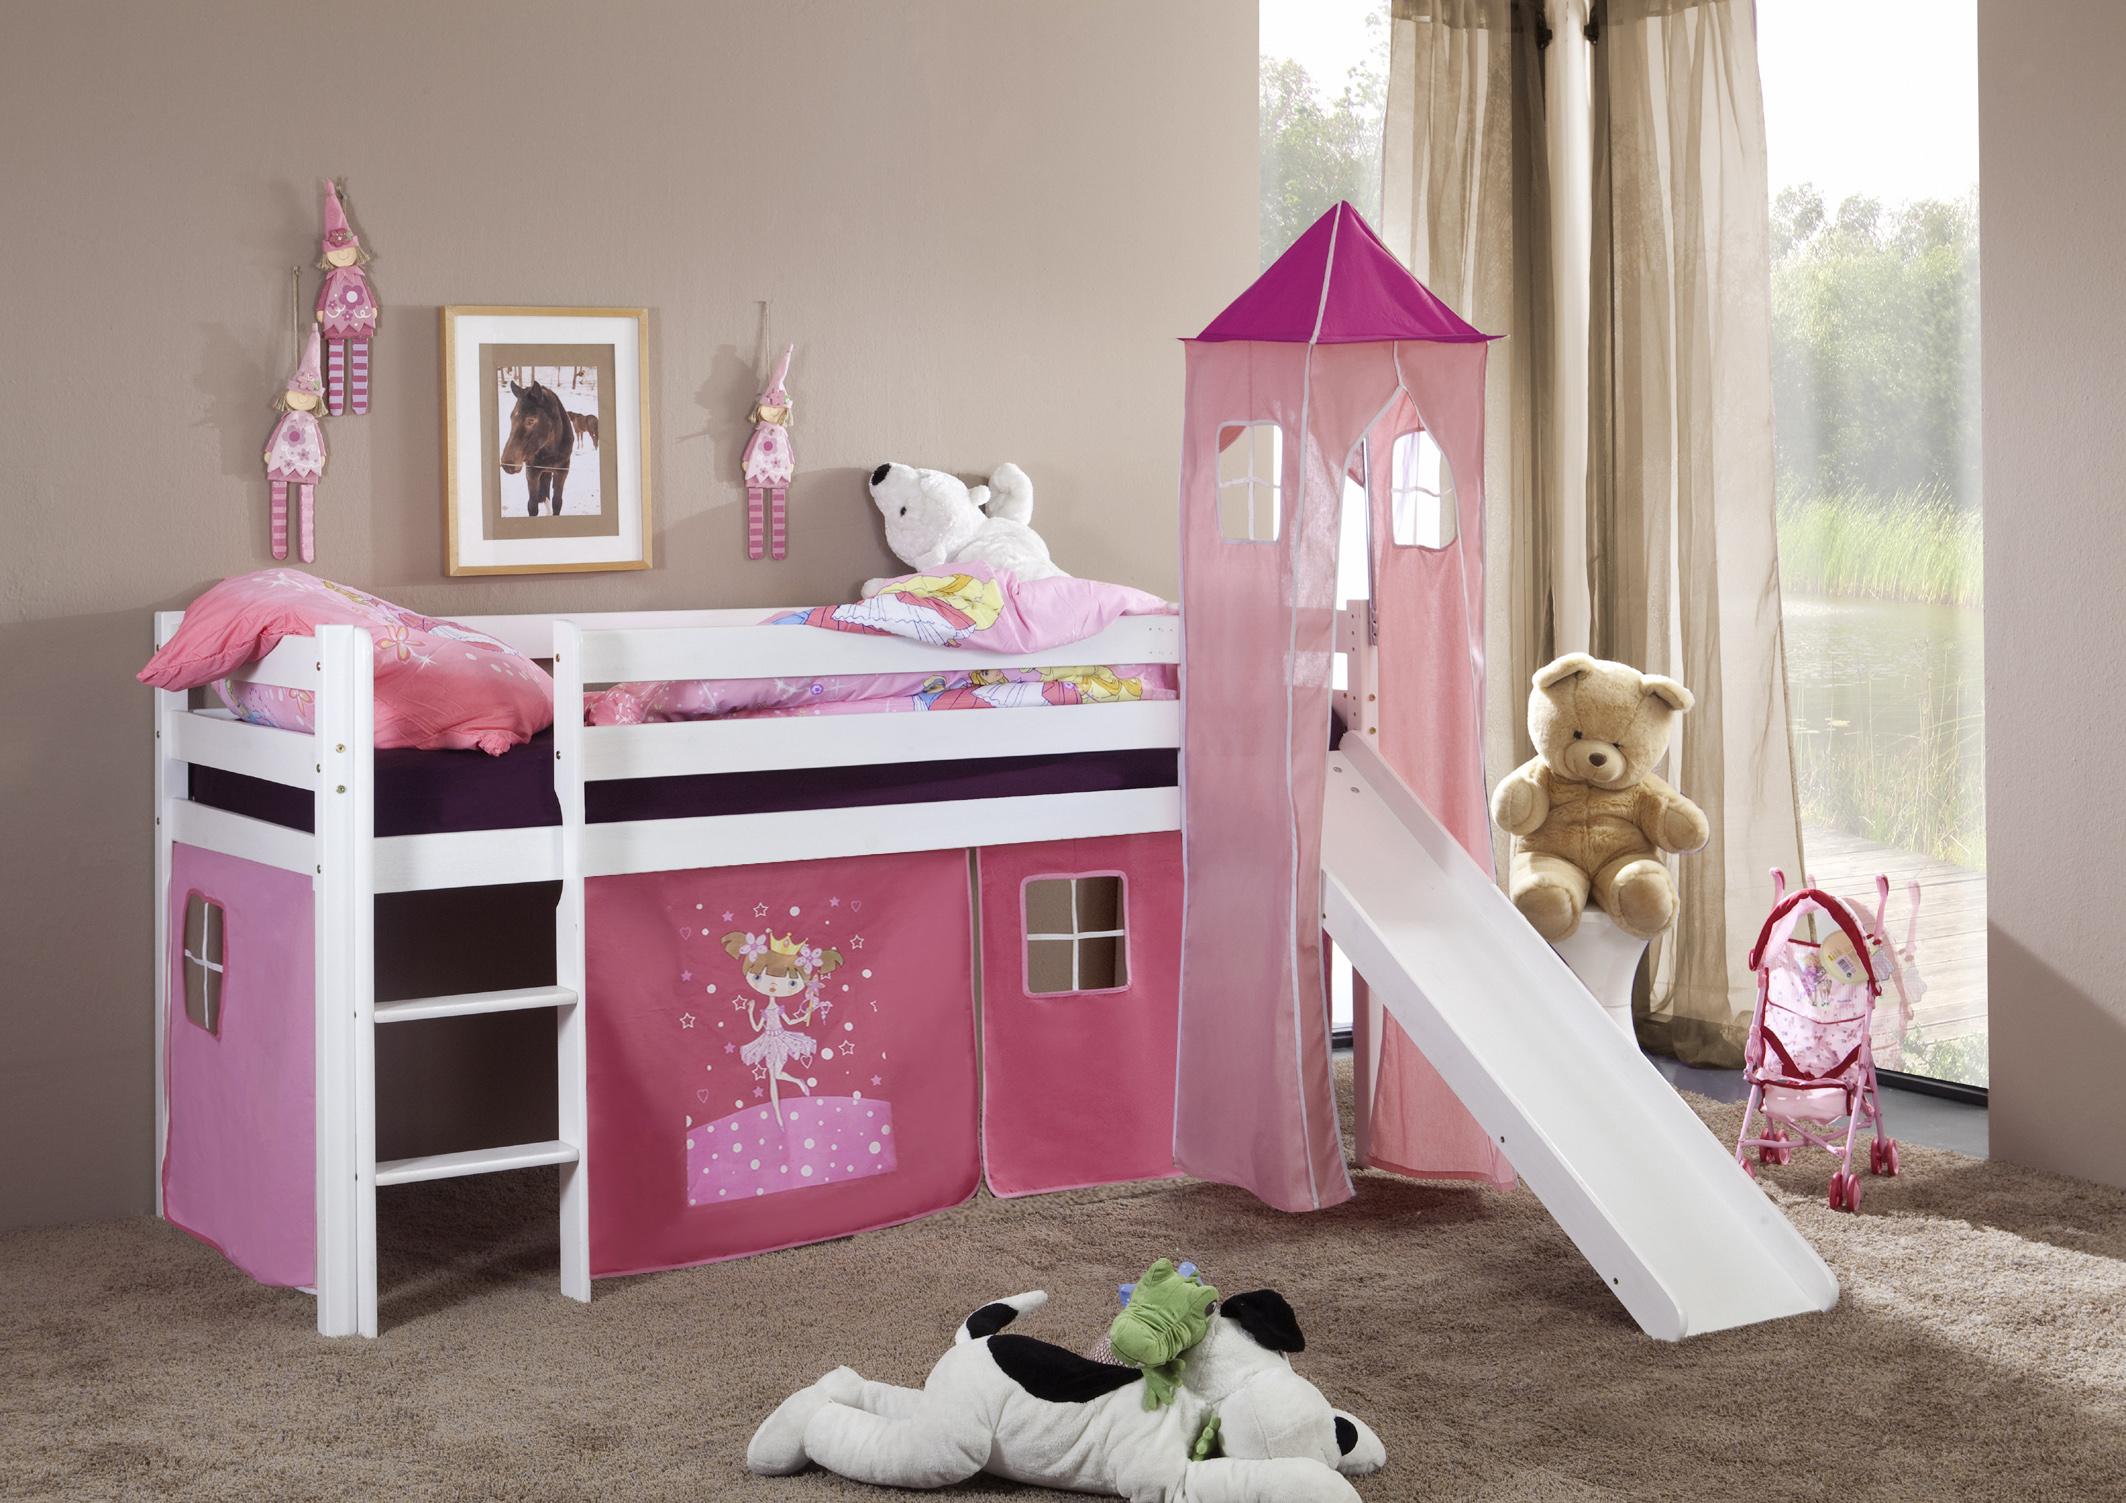 Etagenbett Kiefer Oder Buche : Kinderbett etagenbett buche massiv vollholz weiß lackiert